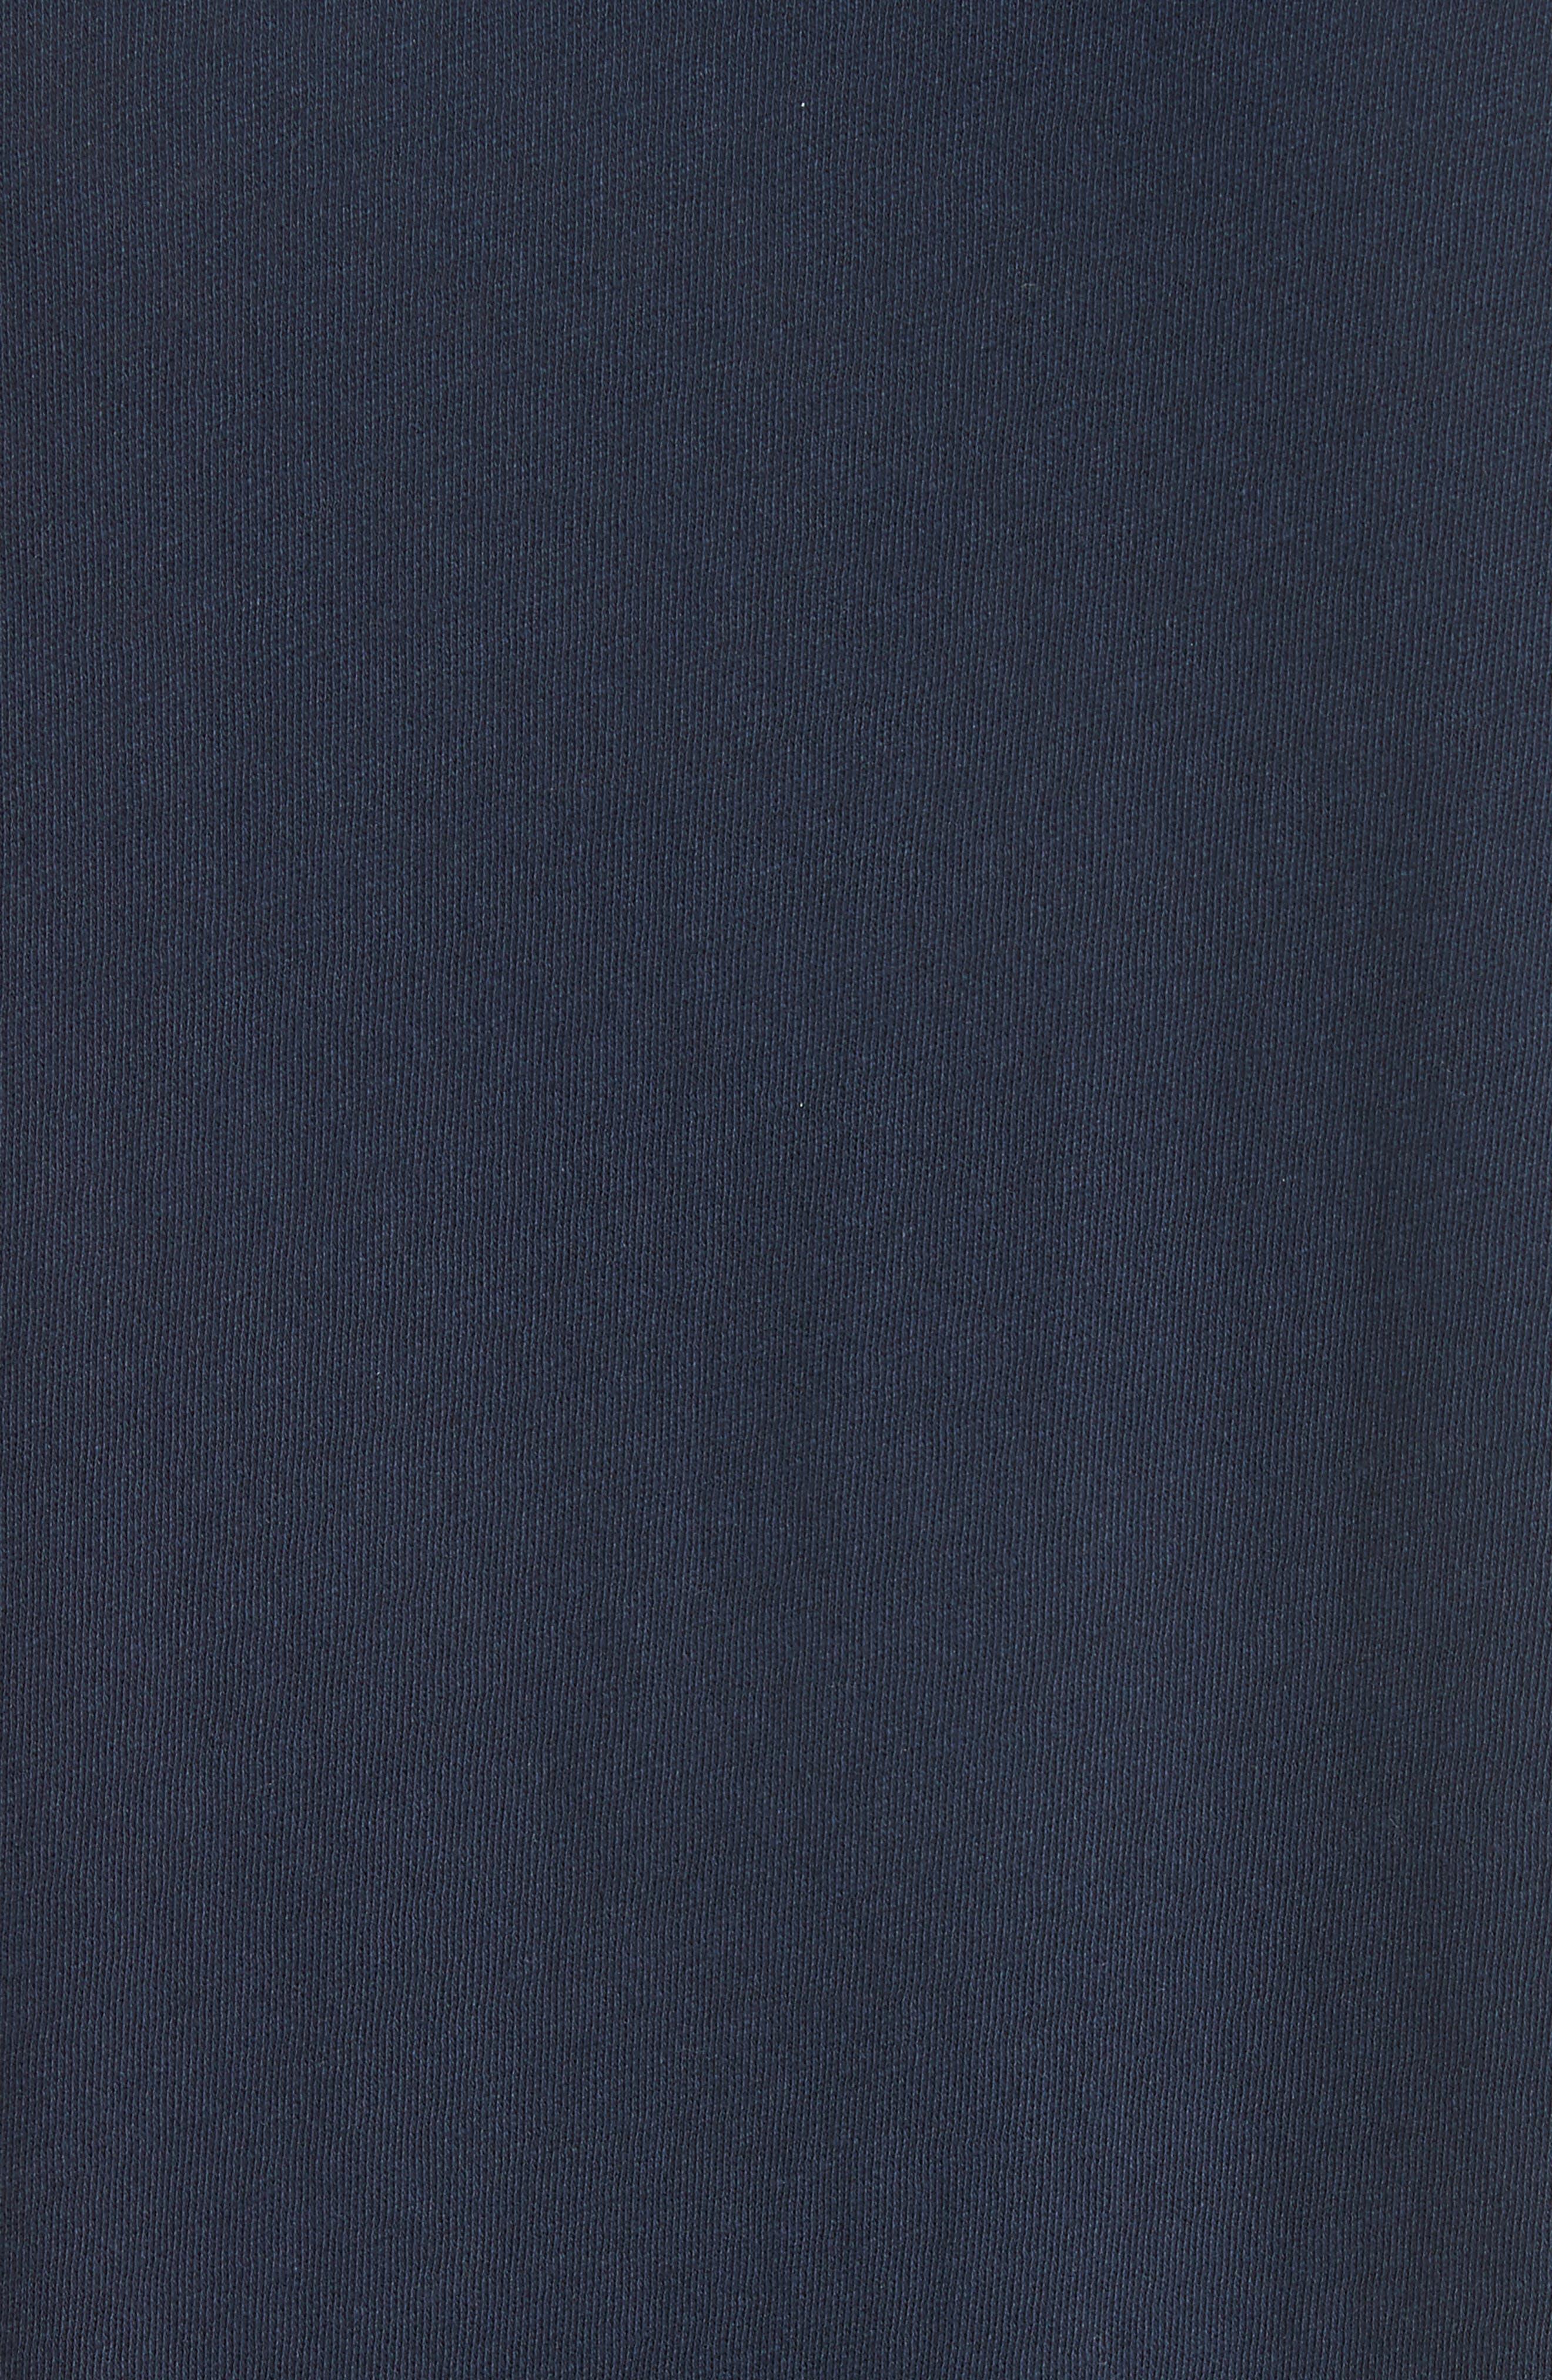 Hartley Crewneck Cotton & Linen T-Shirt,                             Alternate thumbnail 5, color,                             410